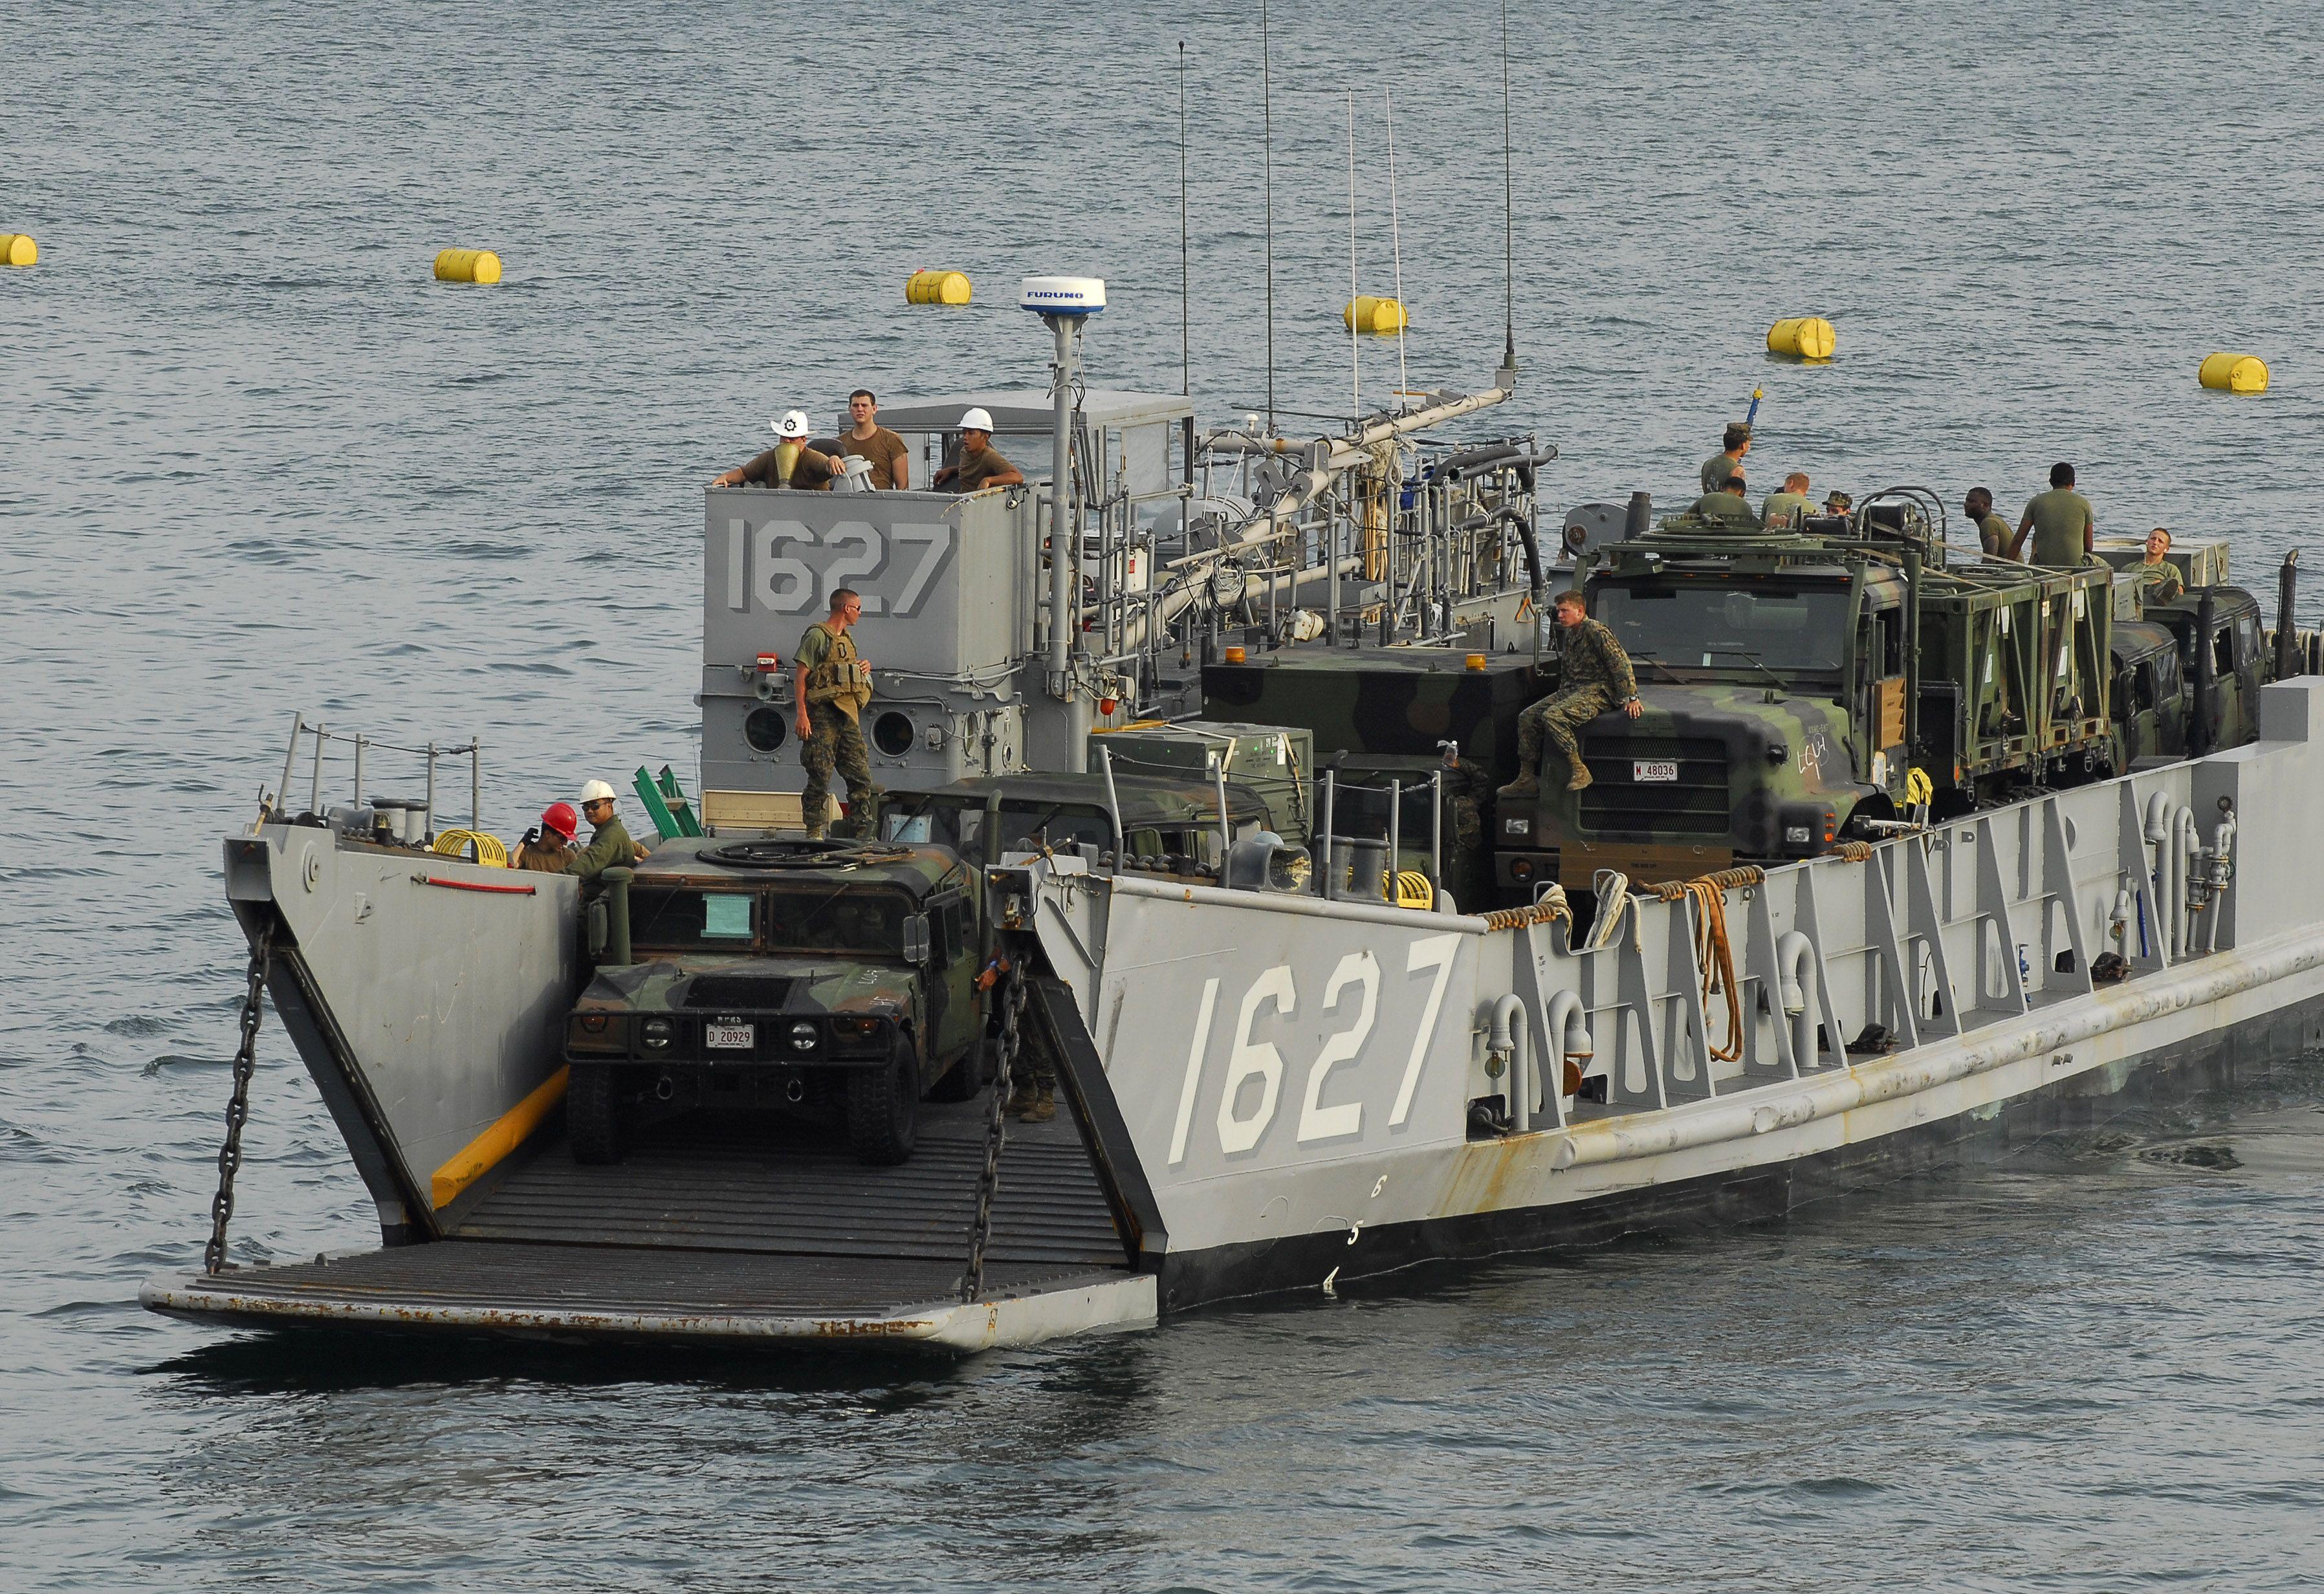 Lcu 1627 landing craft utility usn merchant marine for Military landing craft for sale